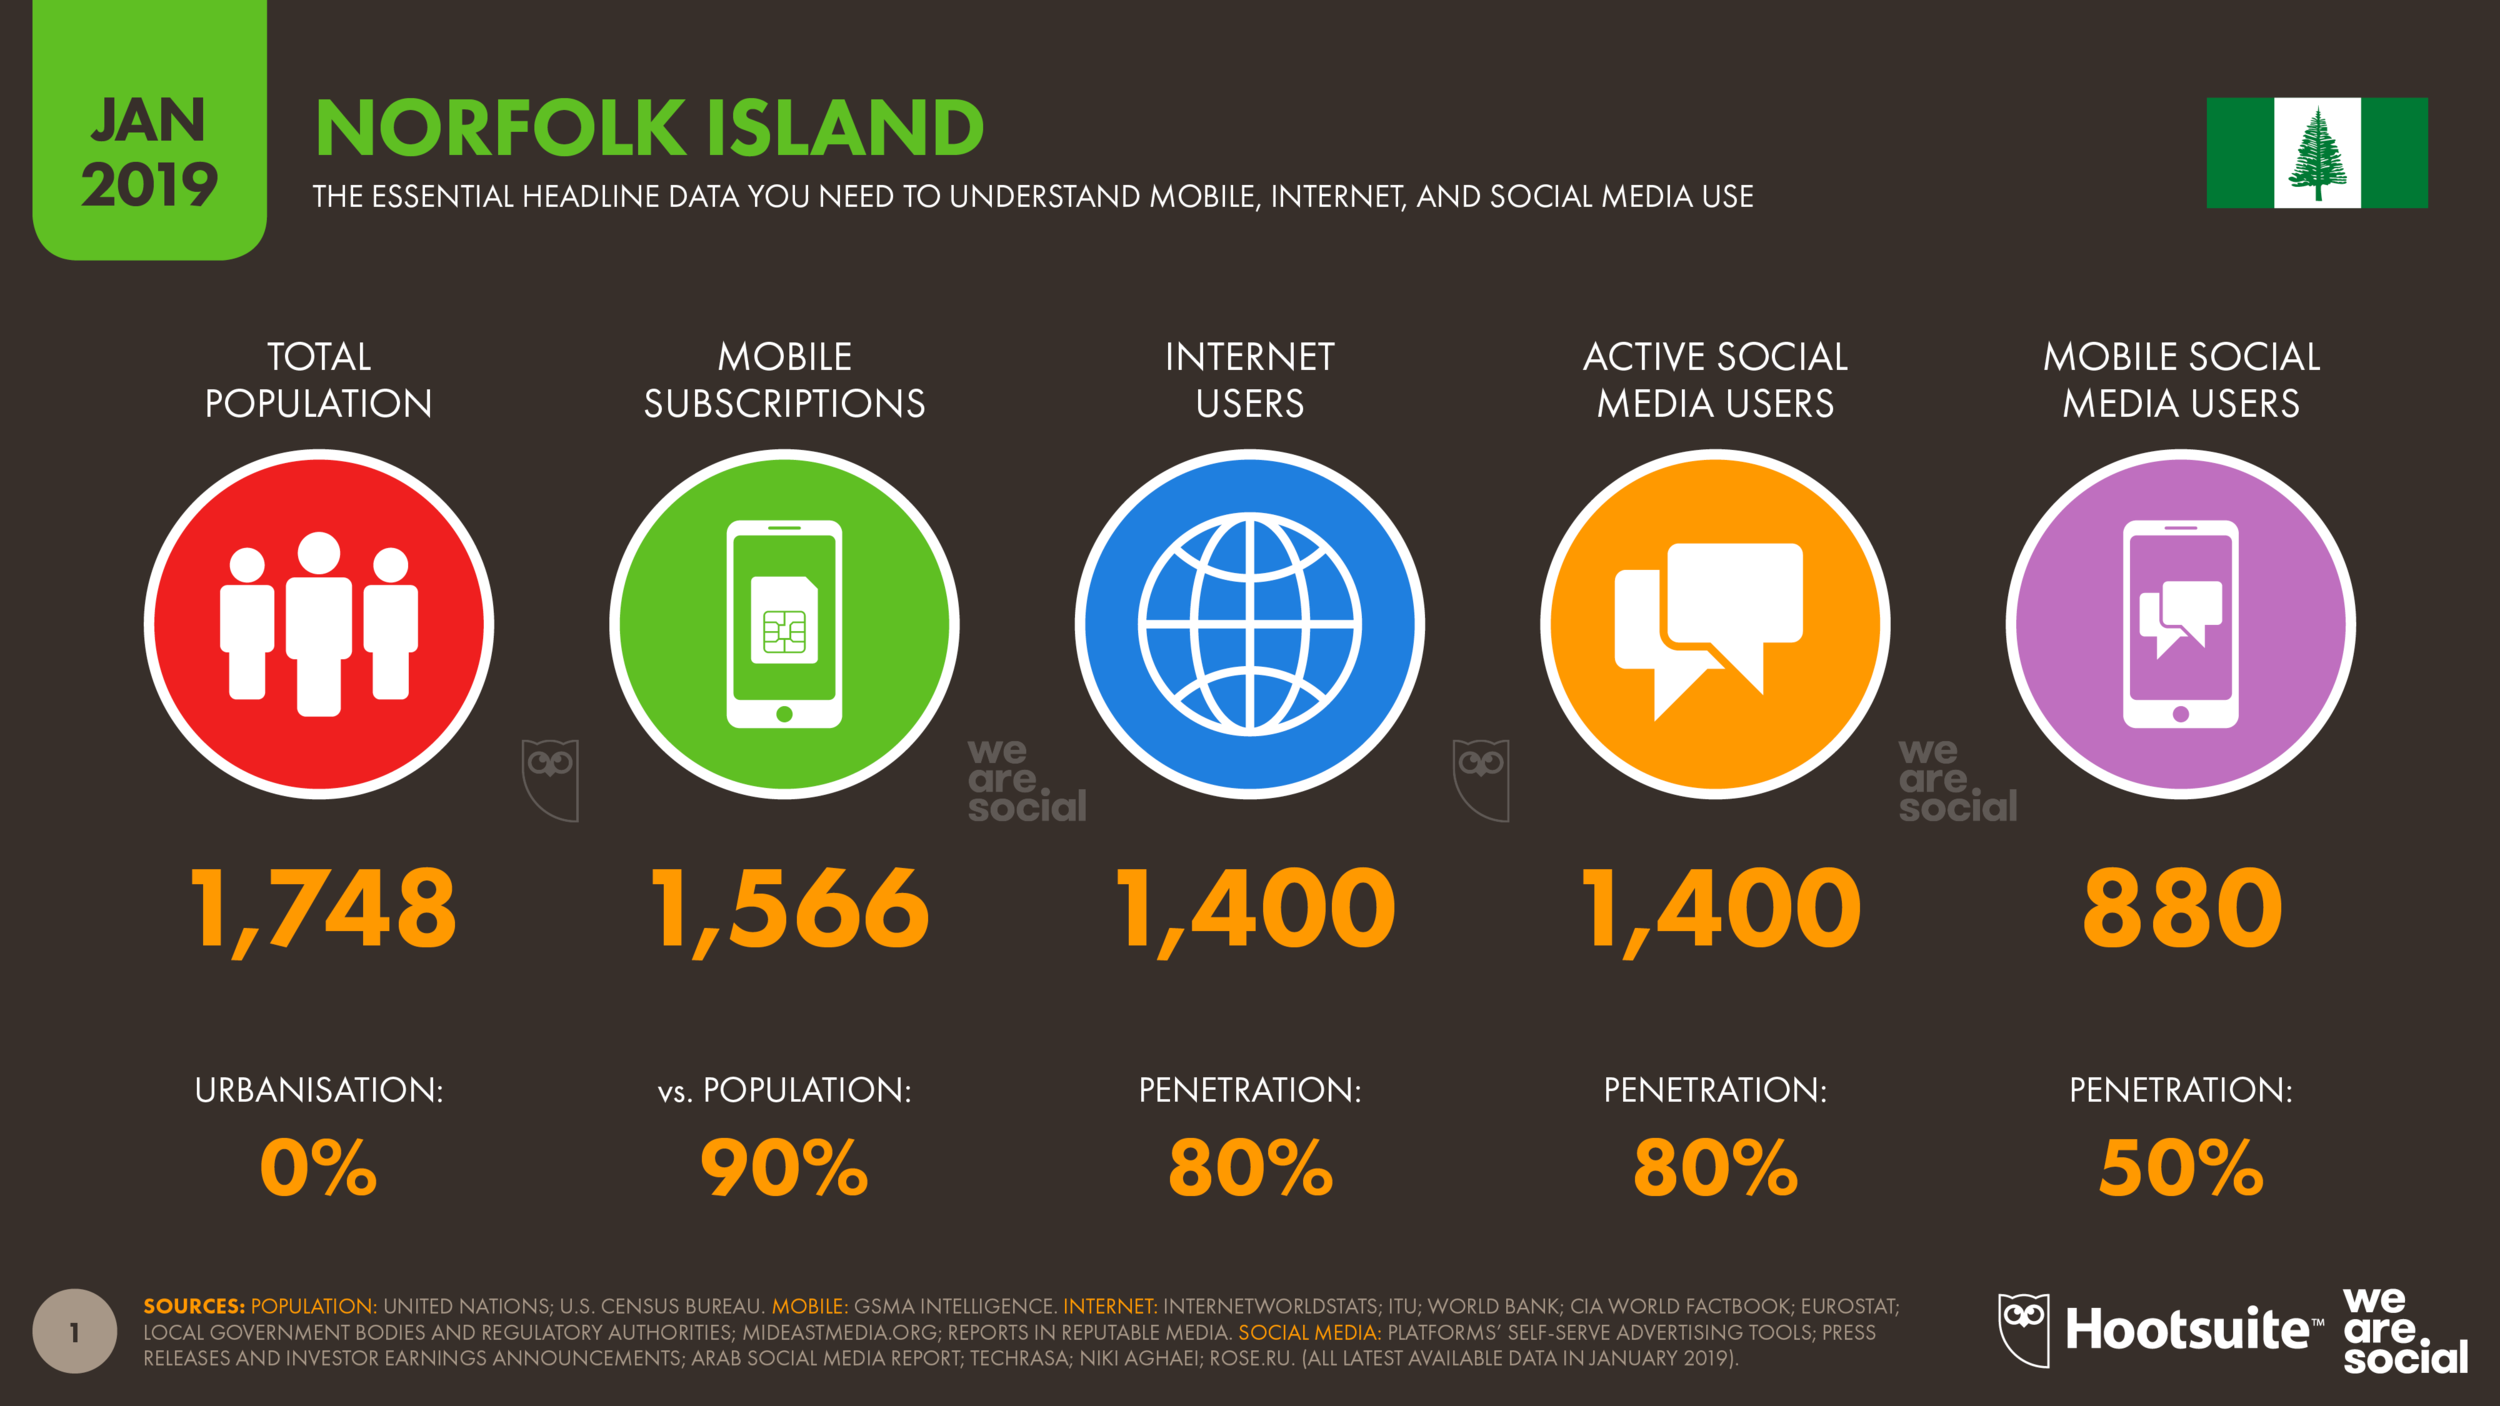 Digital 2019 Norfolk Island January 2019 DataReportal